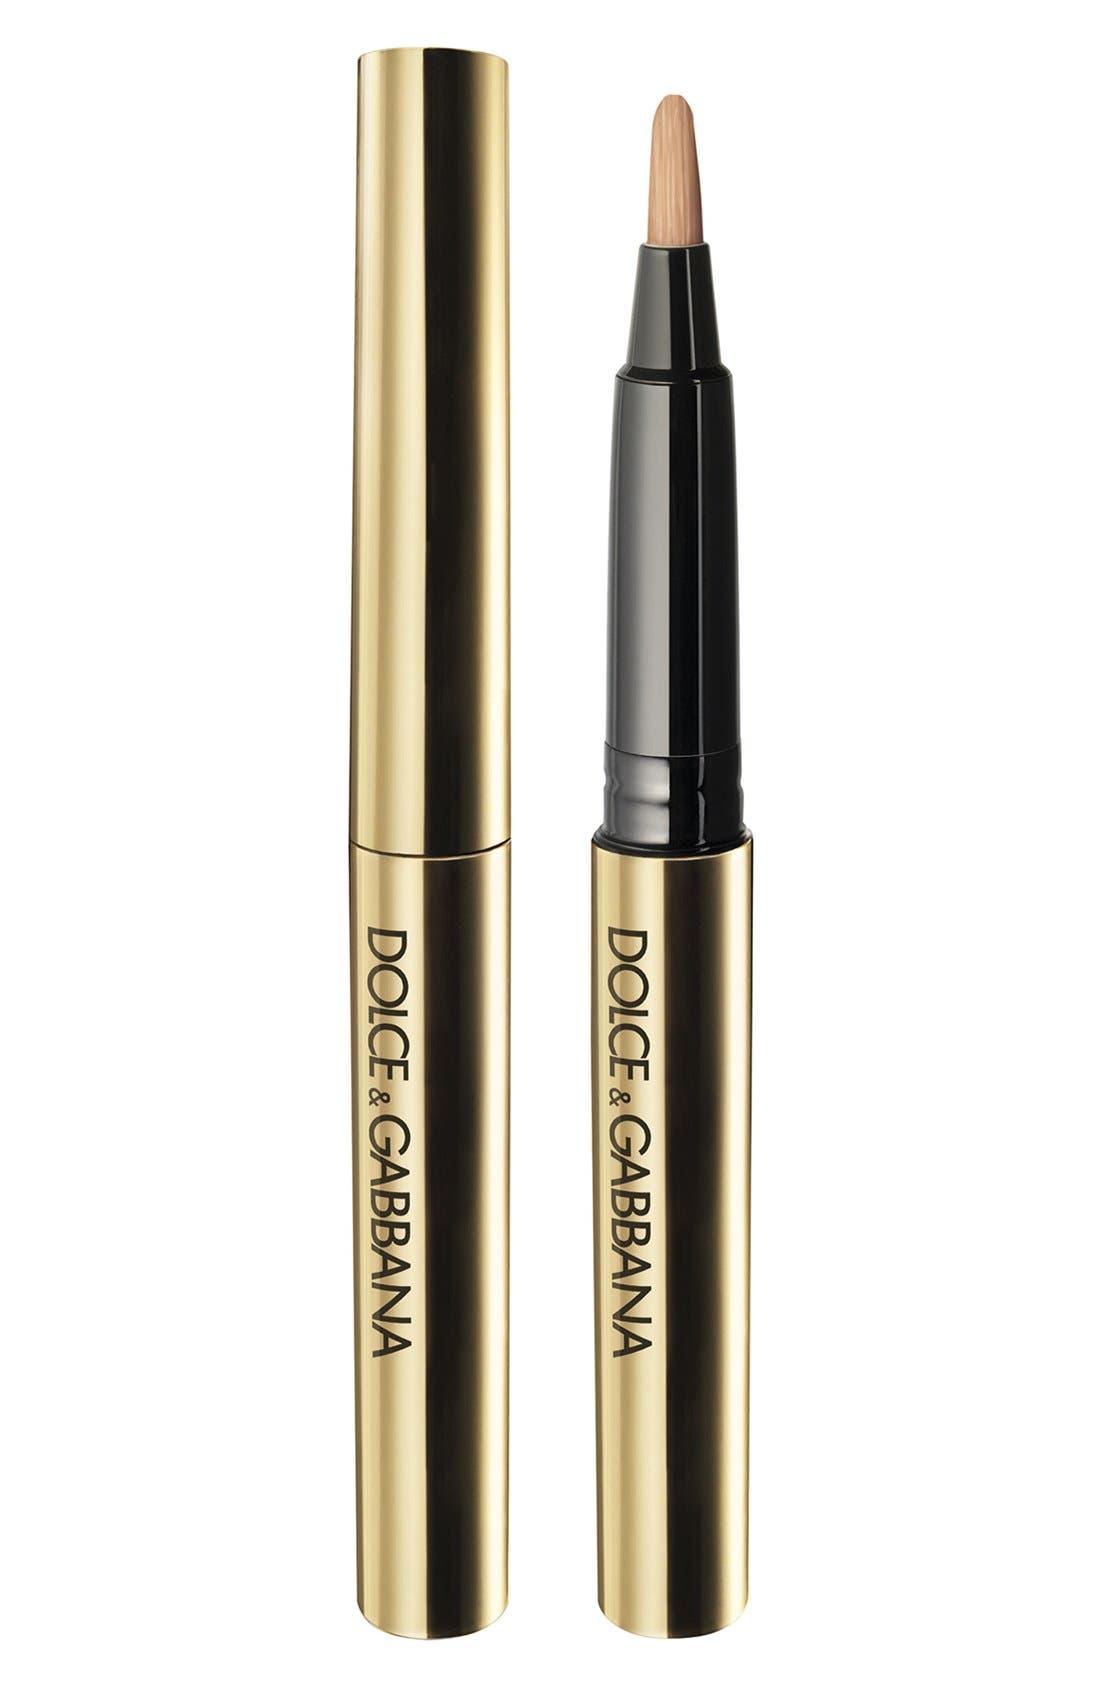 Dolce&Gabbana Beauty Perfect Luminous Concealer